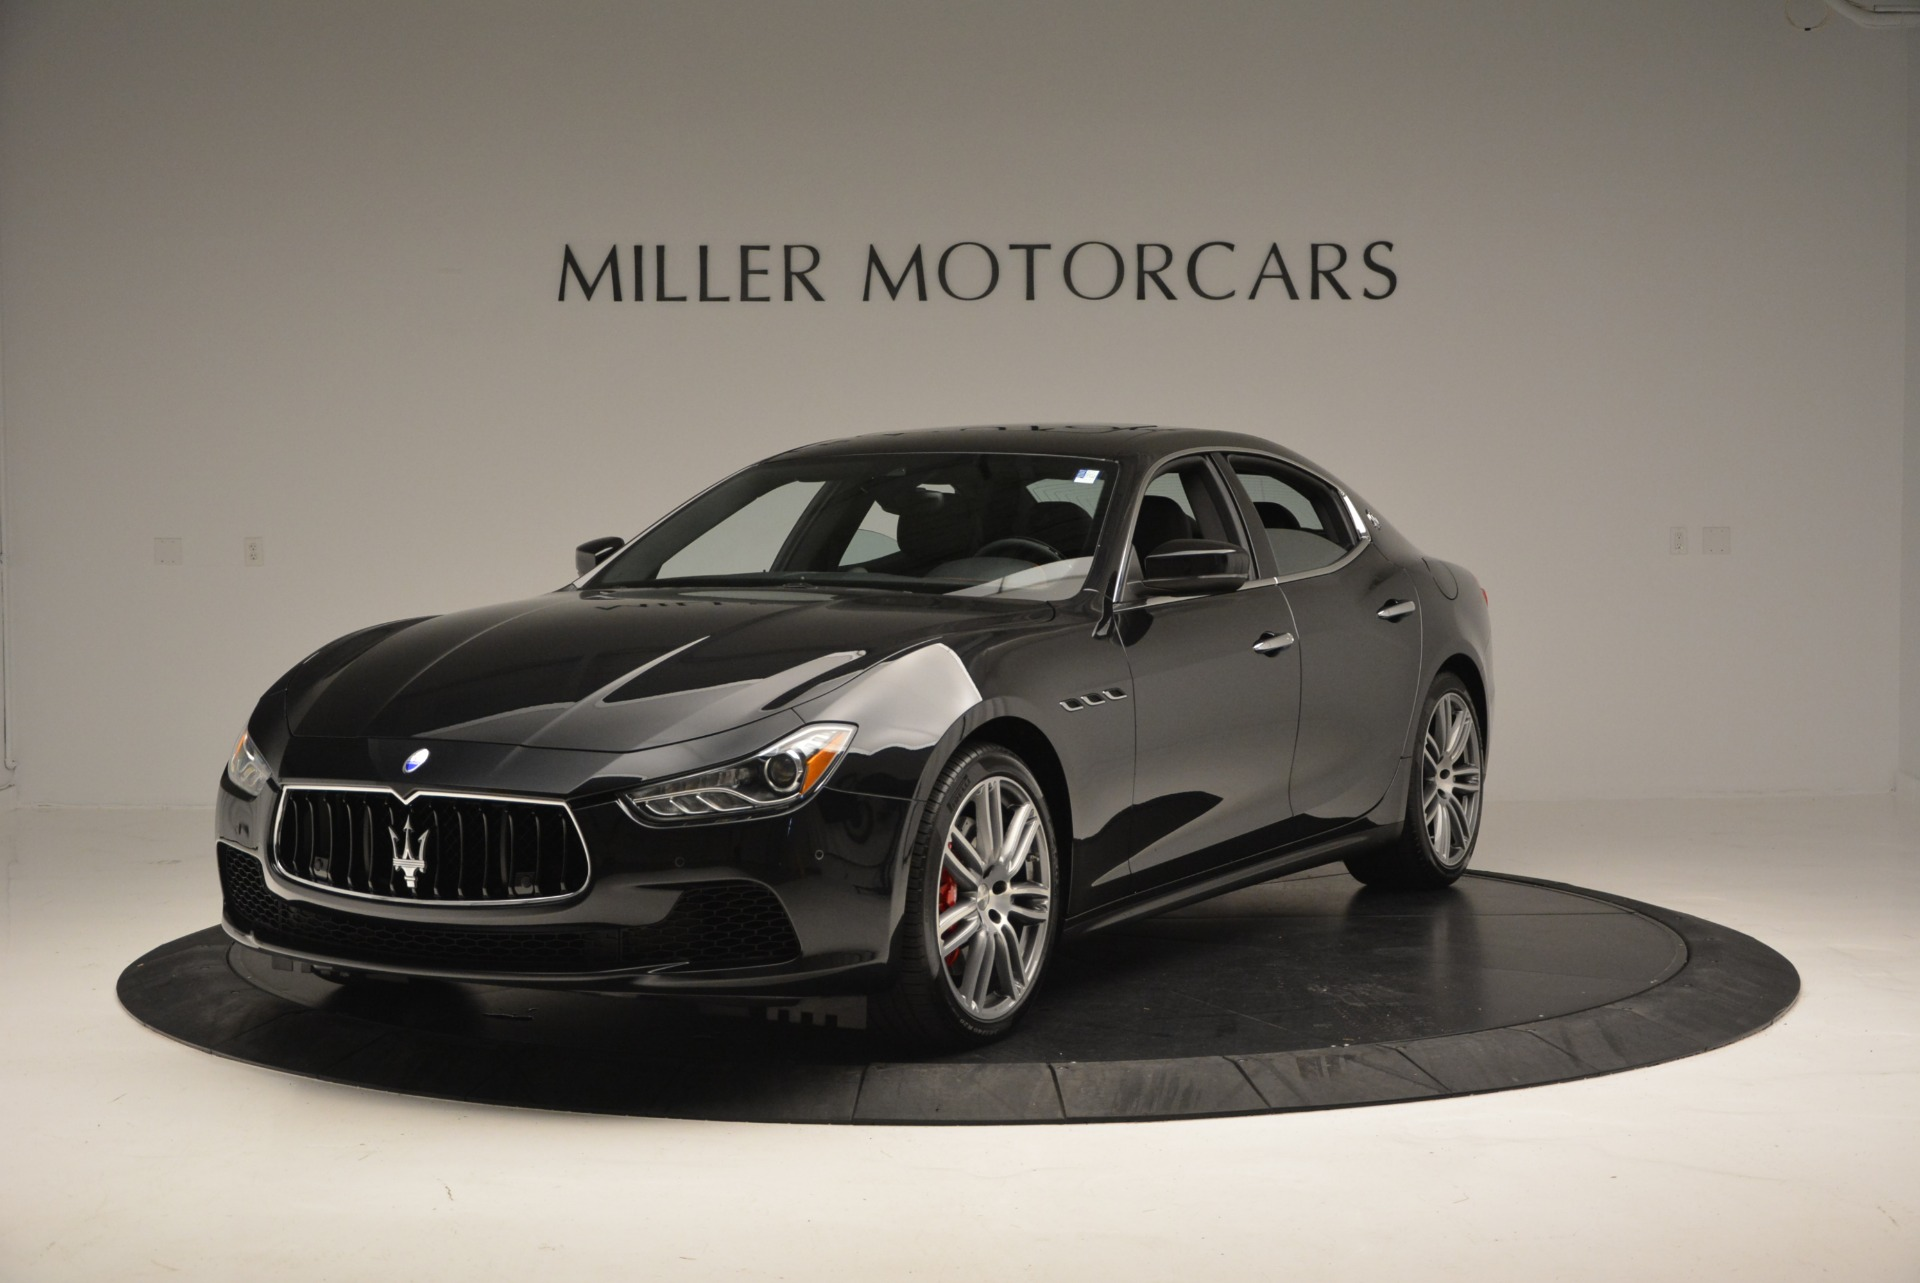 New 2018 Maserati Ghibli S Q4 For Sale In Greenwich, CT. Alfa Romeo of Greenwich, M1982 1820_main